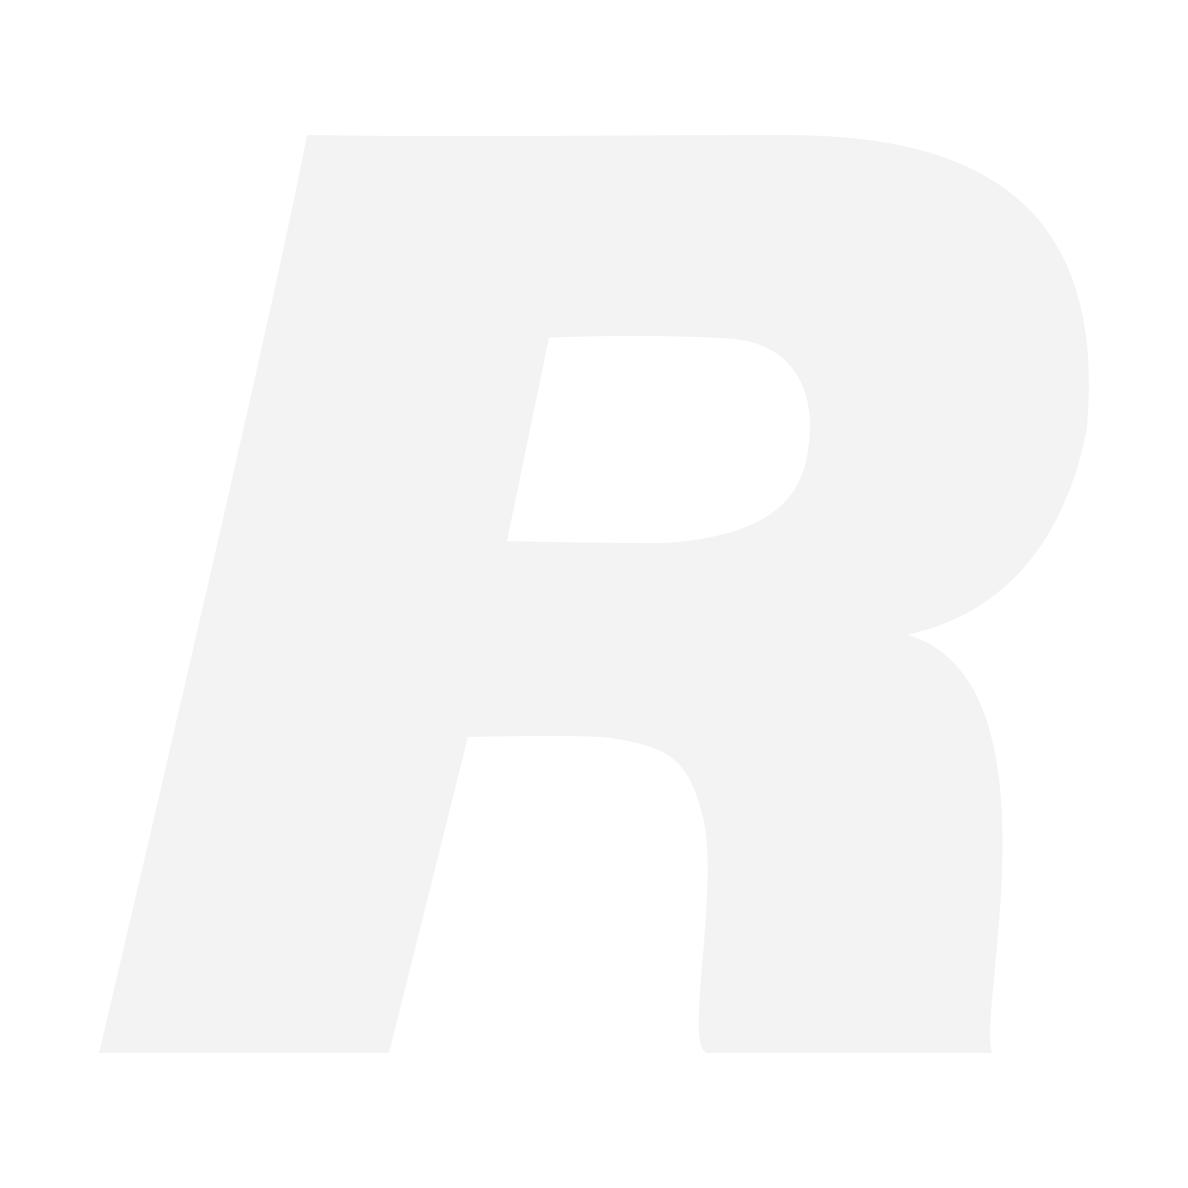 Röde VideoMic Pro Rycote